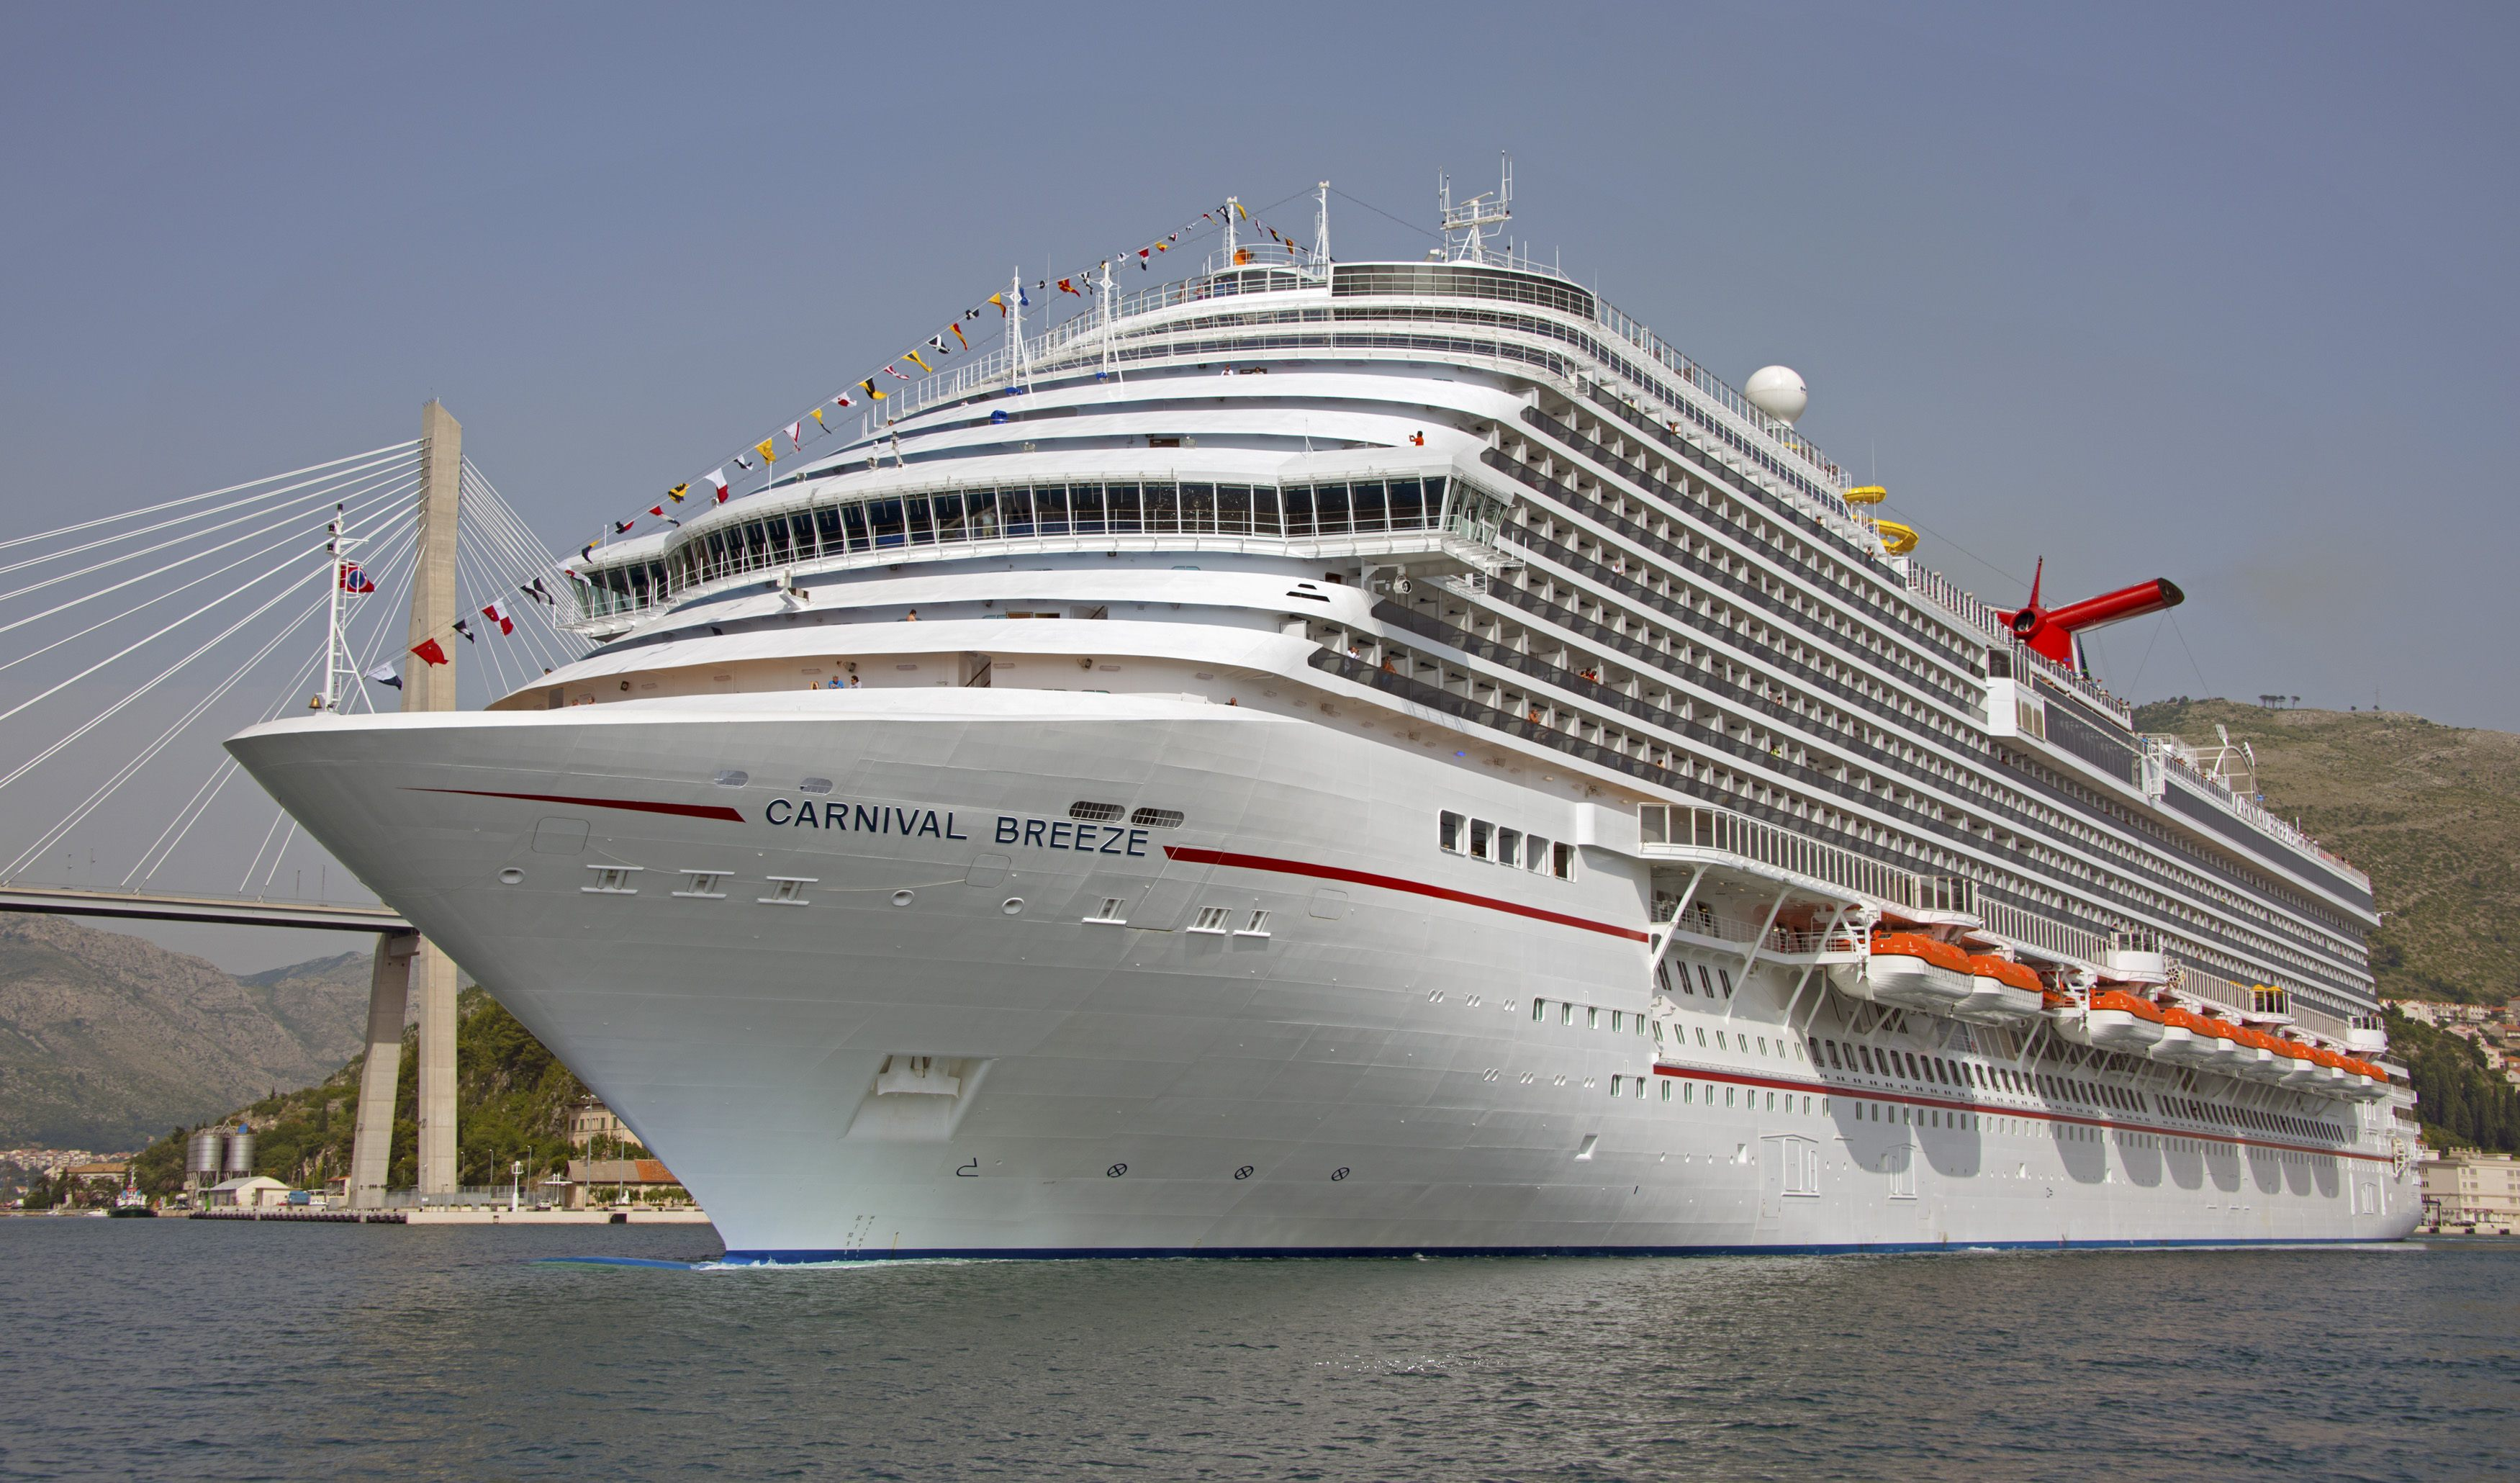 New Carnival Breeze Cruise Ship